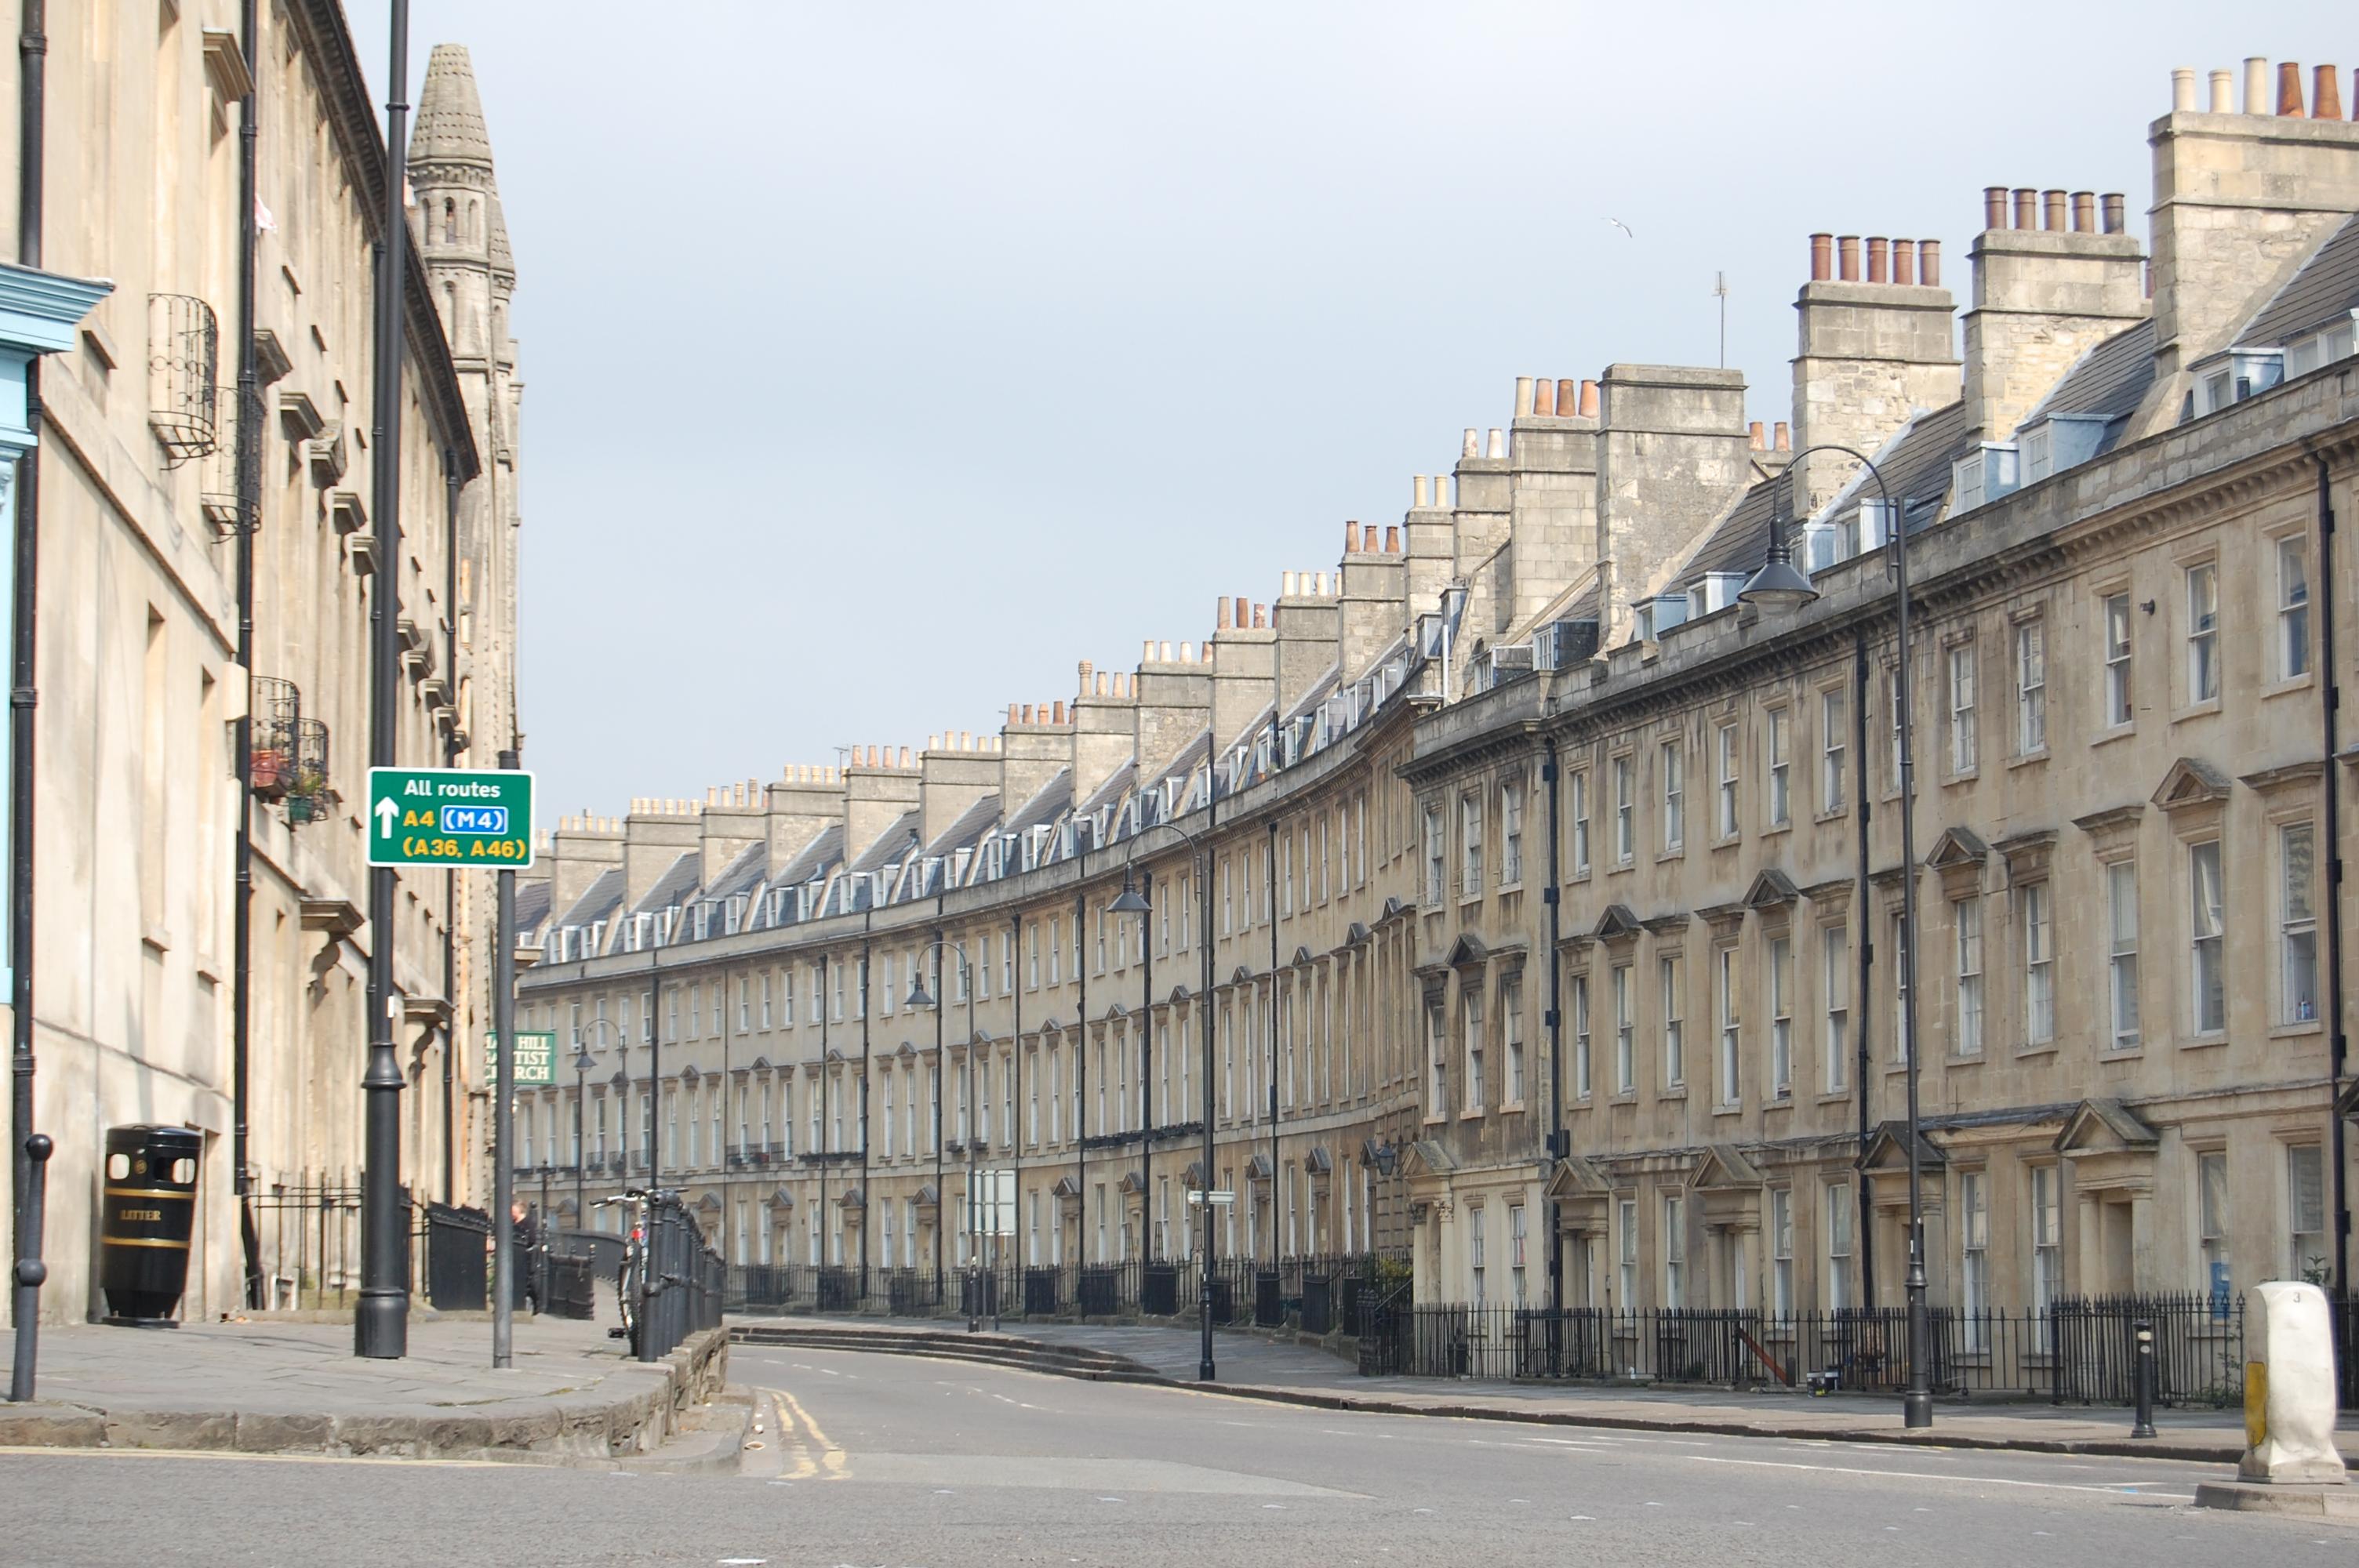 Normal street in Bath